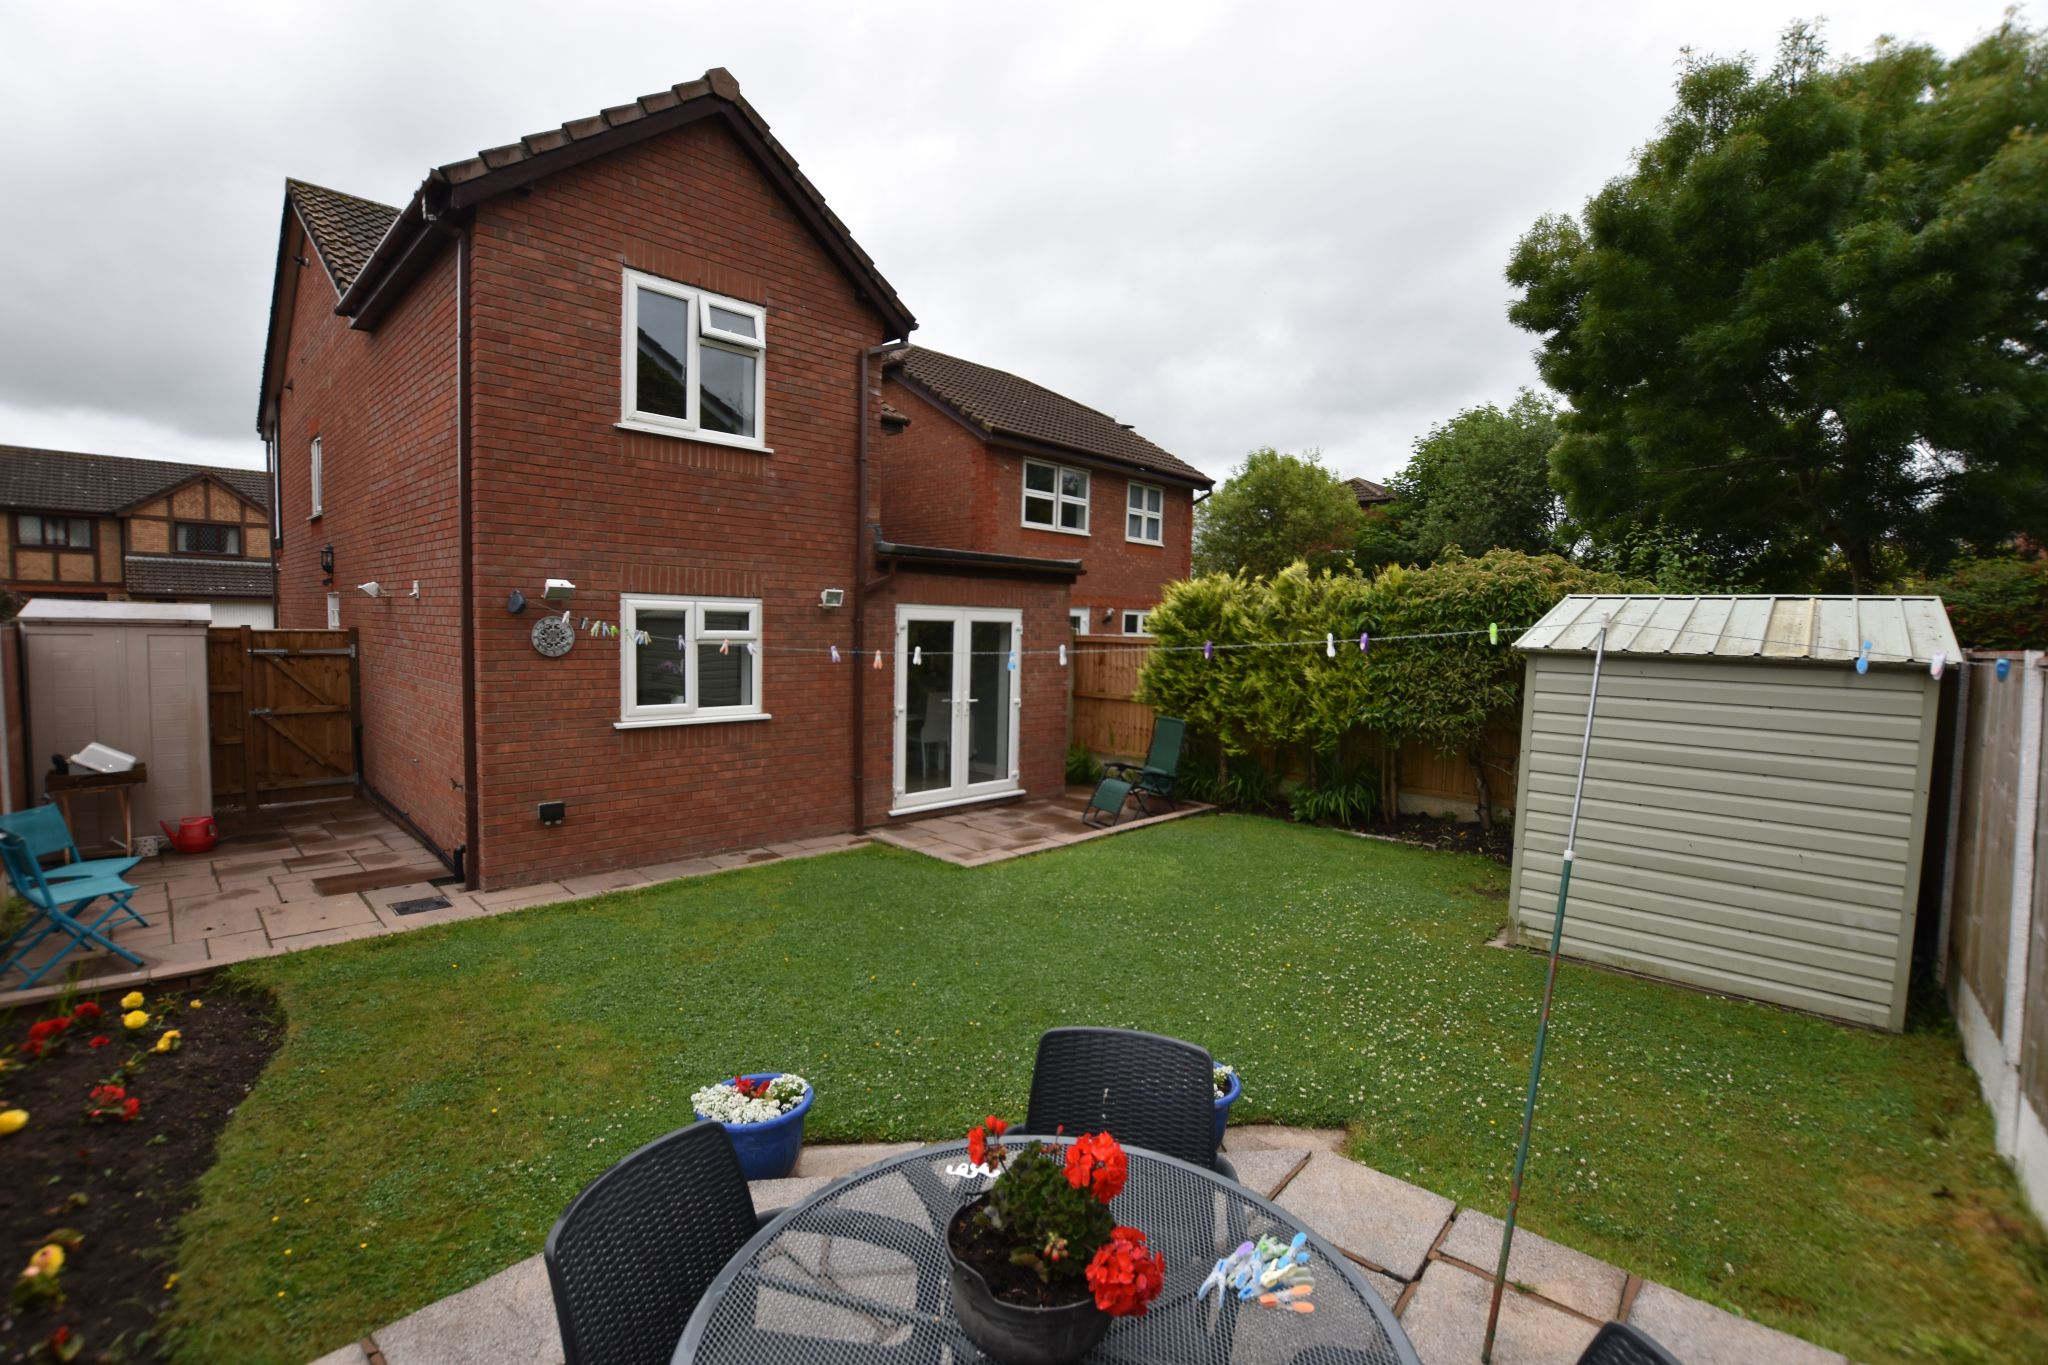 3 bedroom detached house Sold STC in Preston - Rear Garden